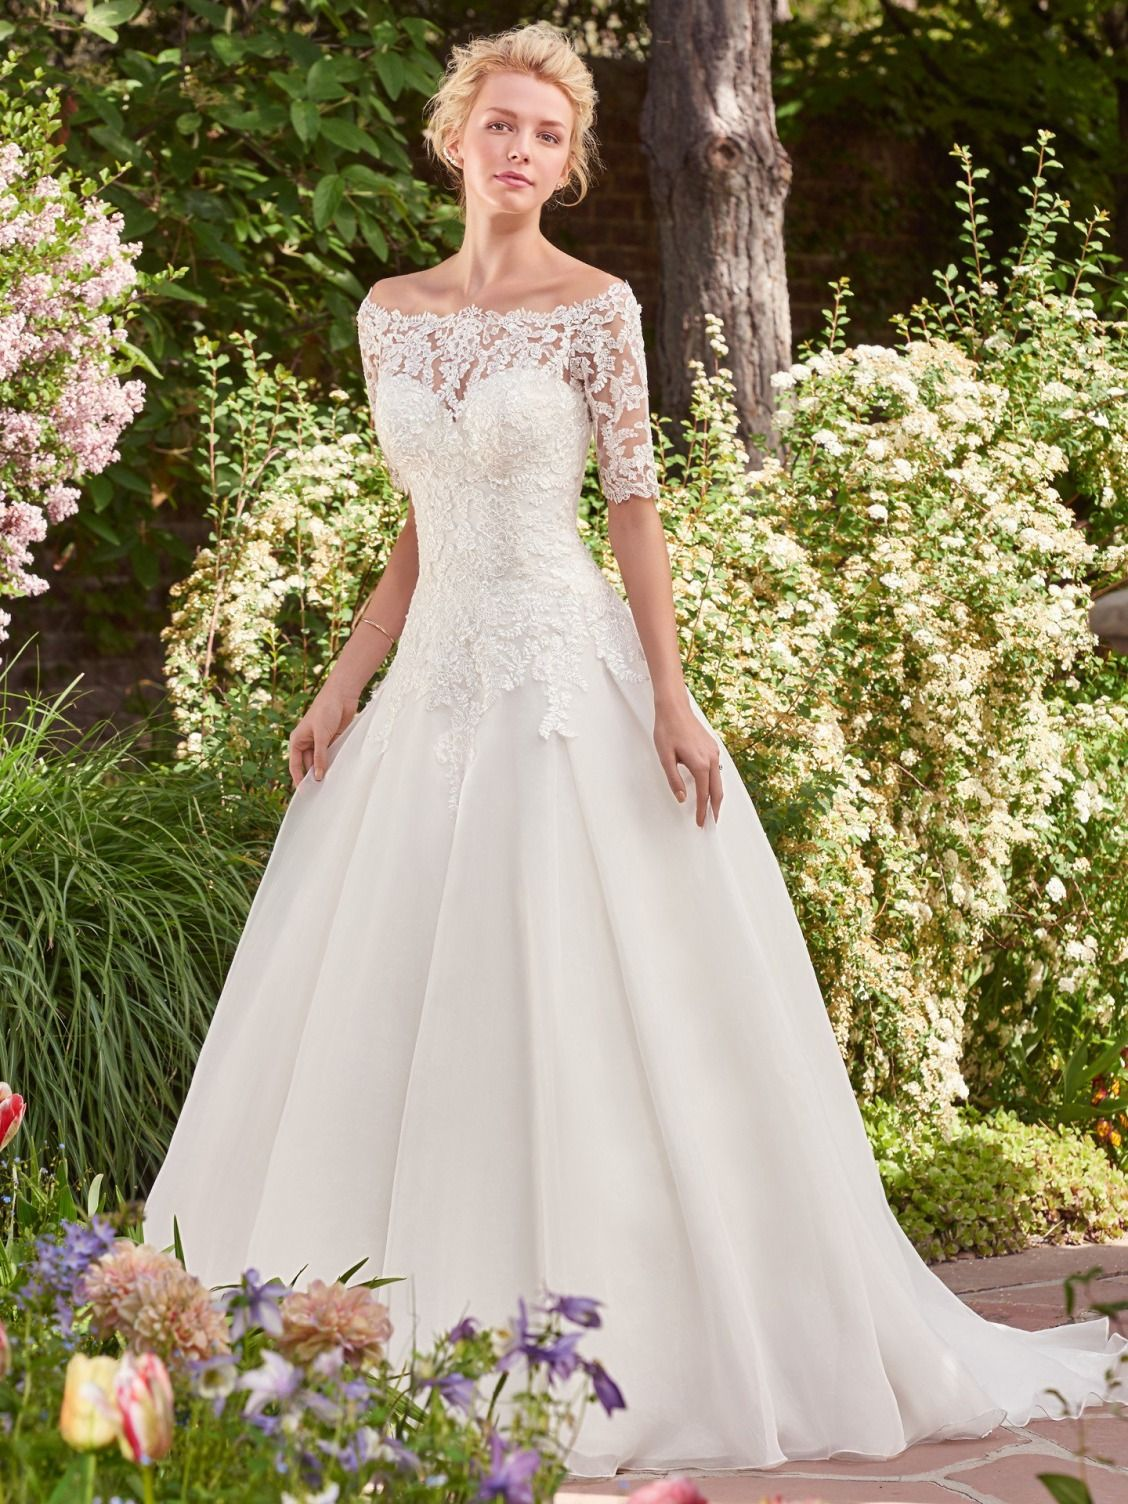 Darlene by rebecca ingram wedding dresses wedding dress